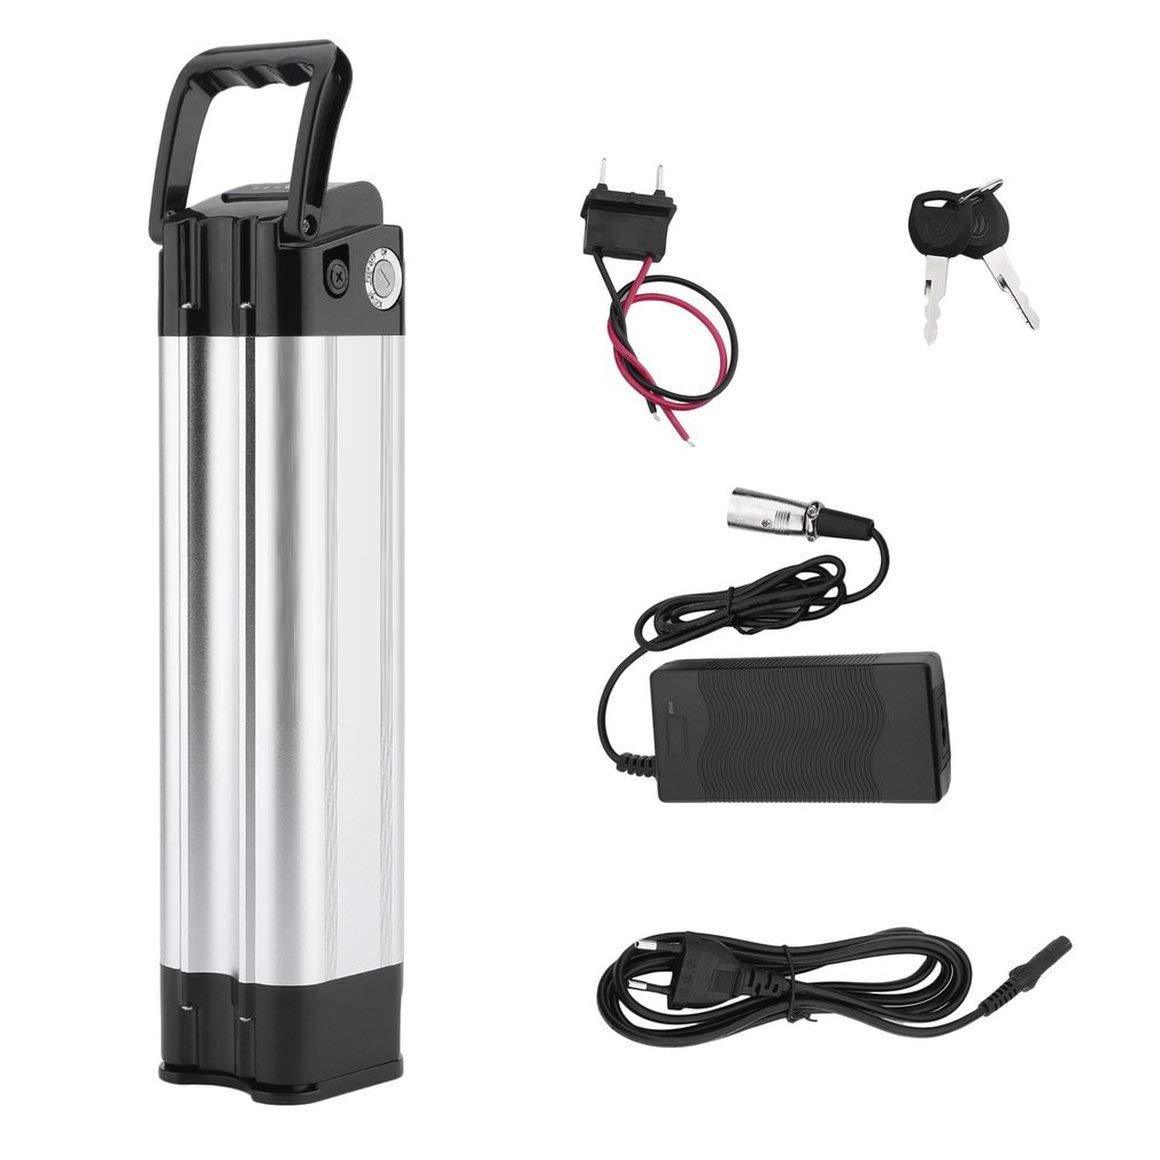 Funnyrunstore Hochleistungs-Elektro-Fahrrad-Batterie 24V 10.4Ah E-Bike-Lithium-Ionen-Batterie mit Ladegerät Elektrofahrrad-Umrüstsatz